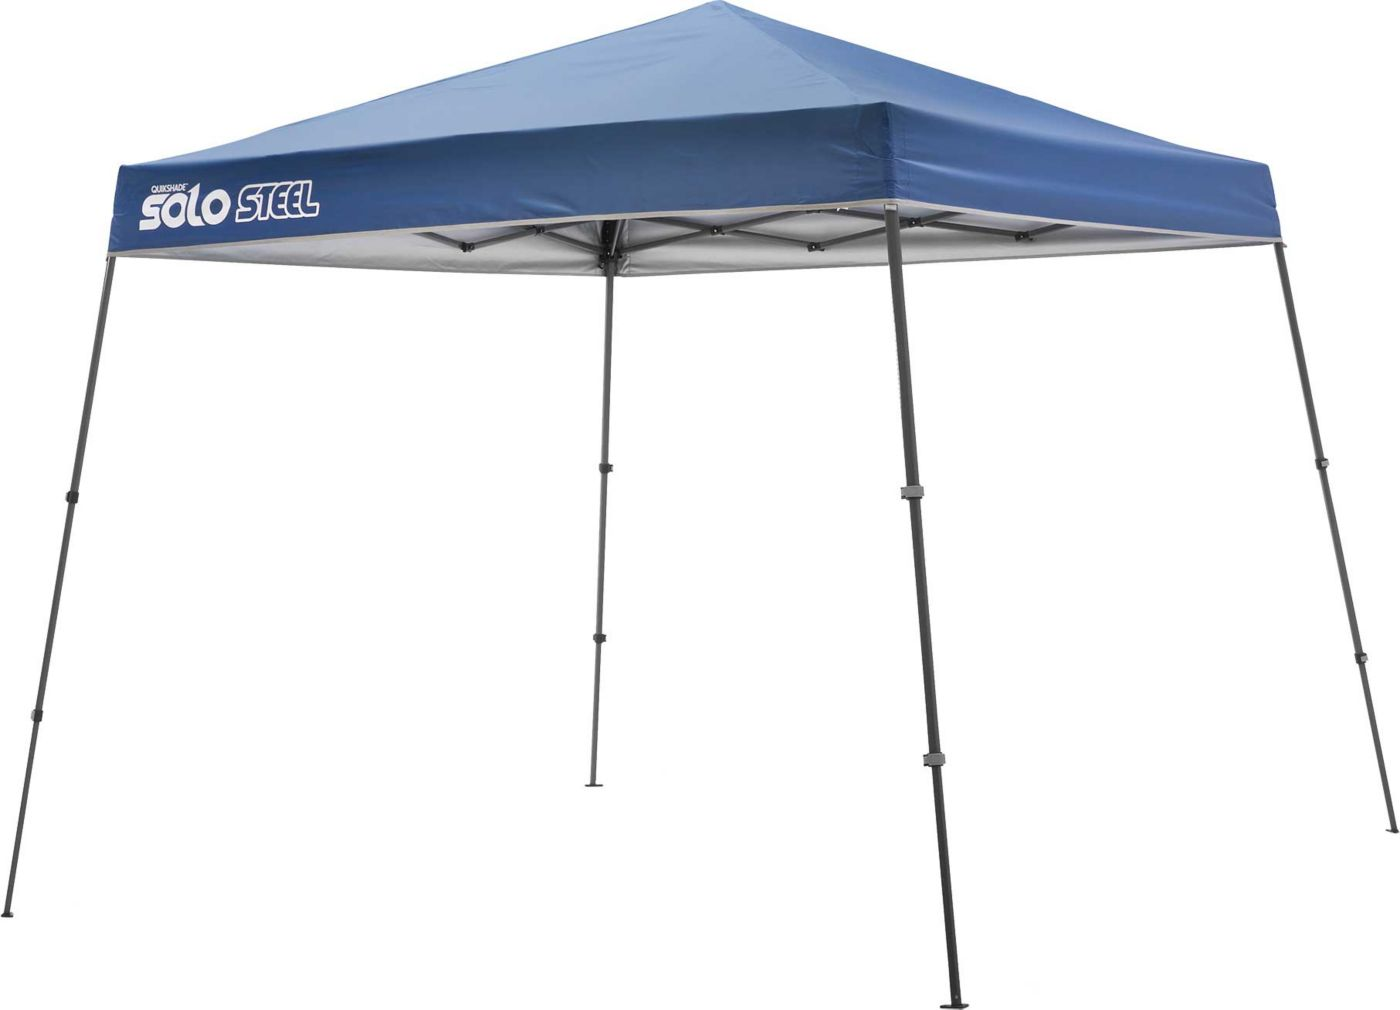 Quik Shade 10' X 10' Solo Steel 64 Slant Leg Canopy